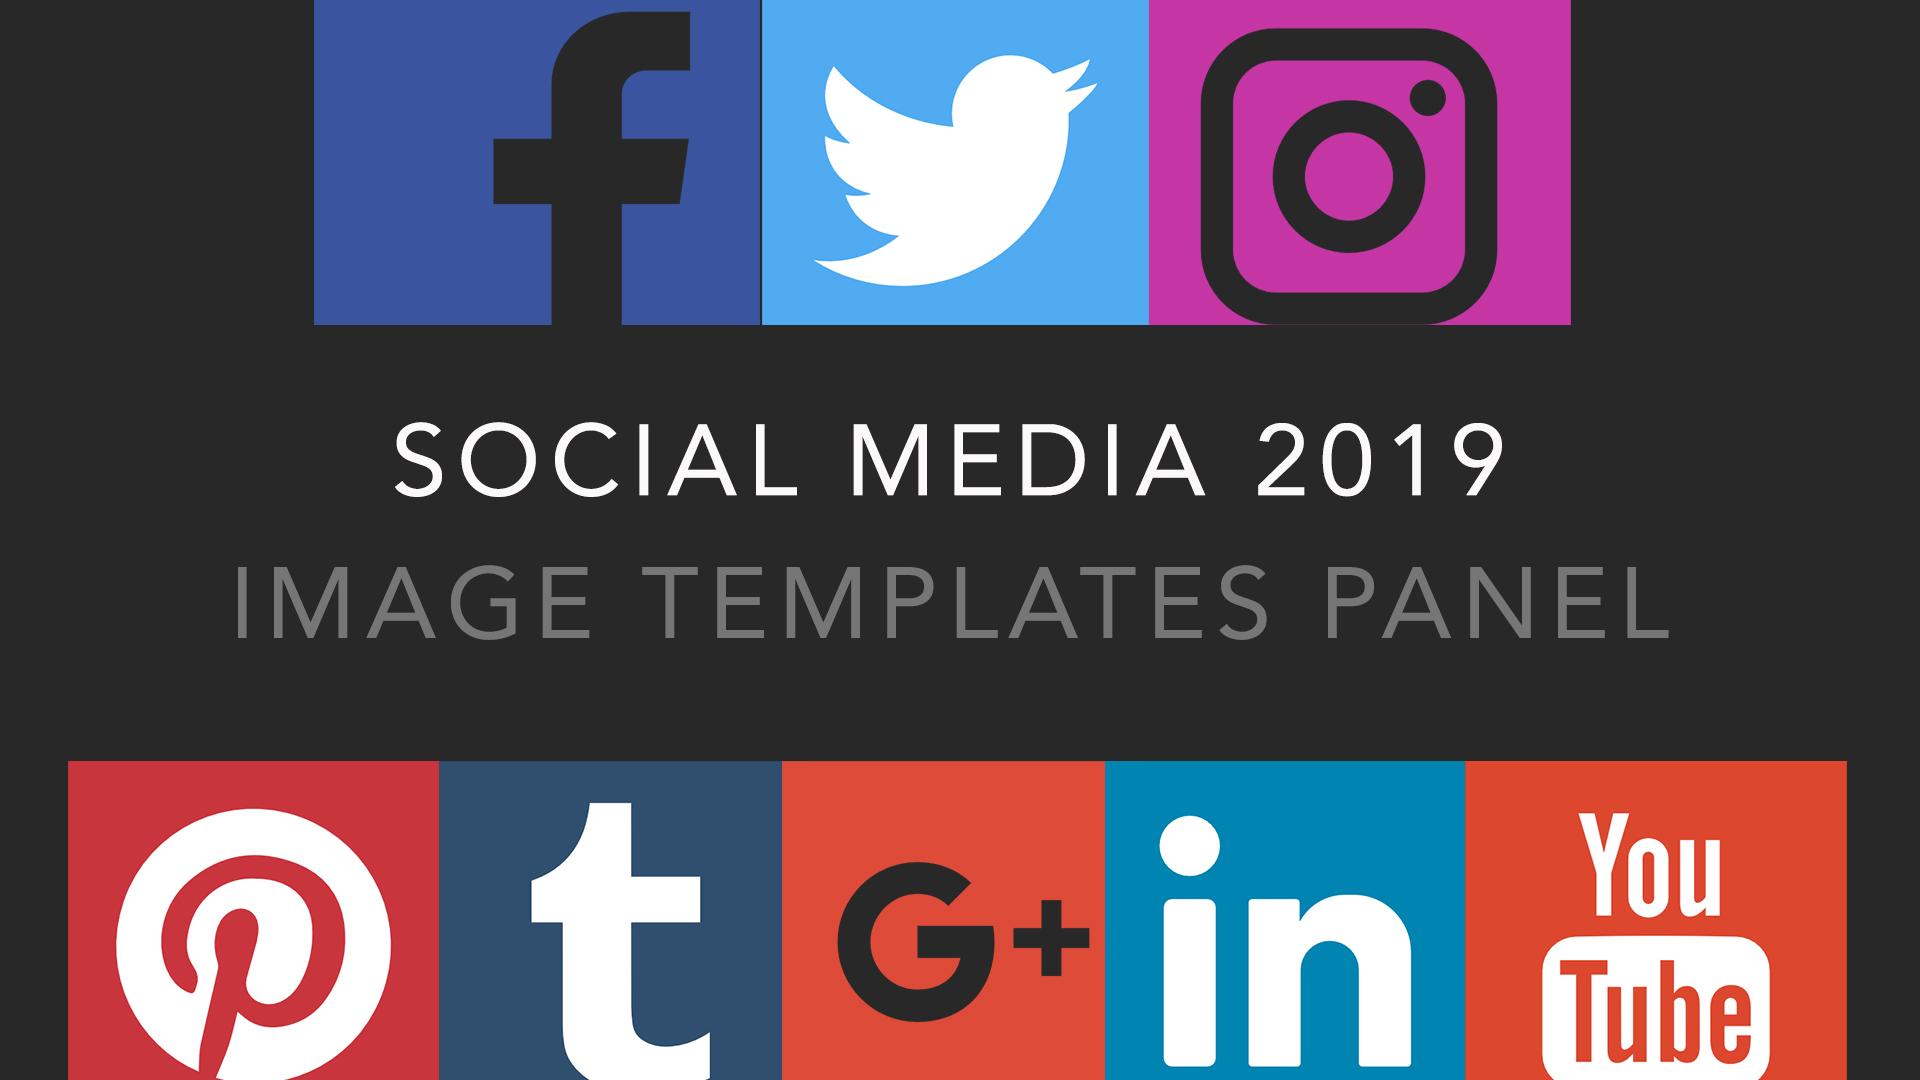 SOCIAL MEDIA IMAGE TEMPLATES 2019